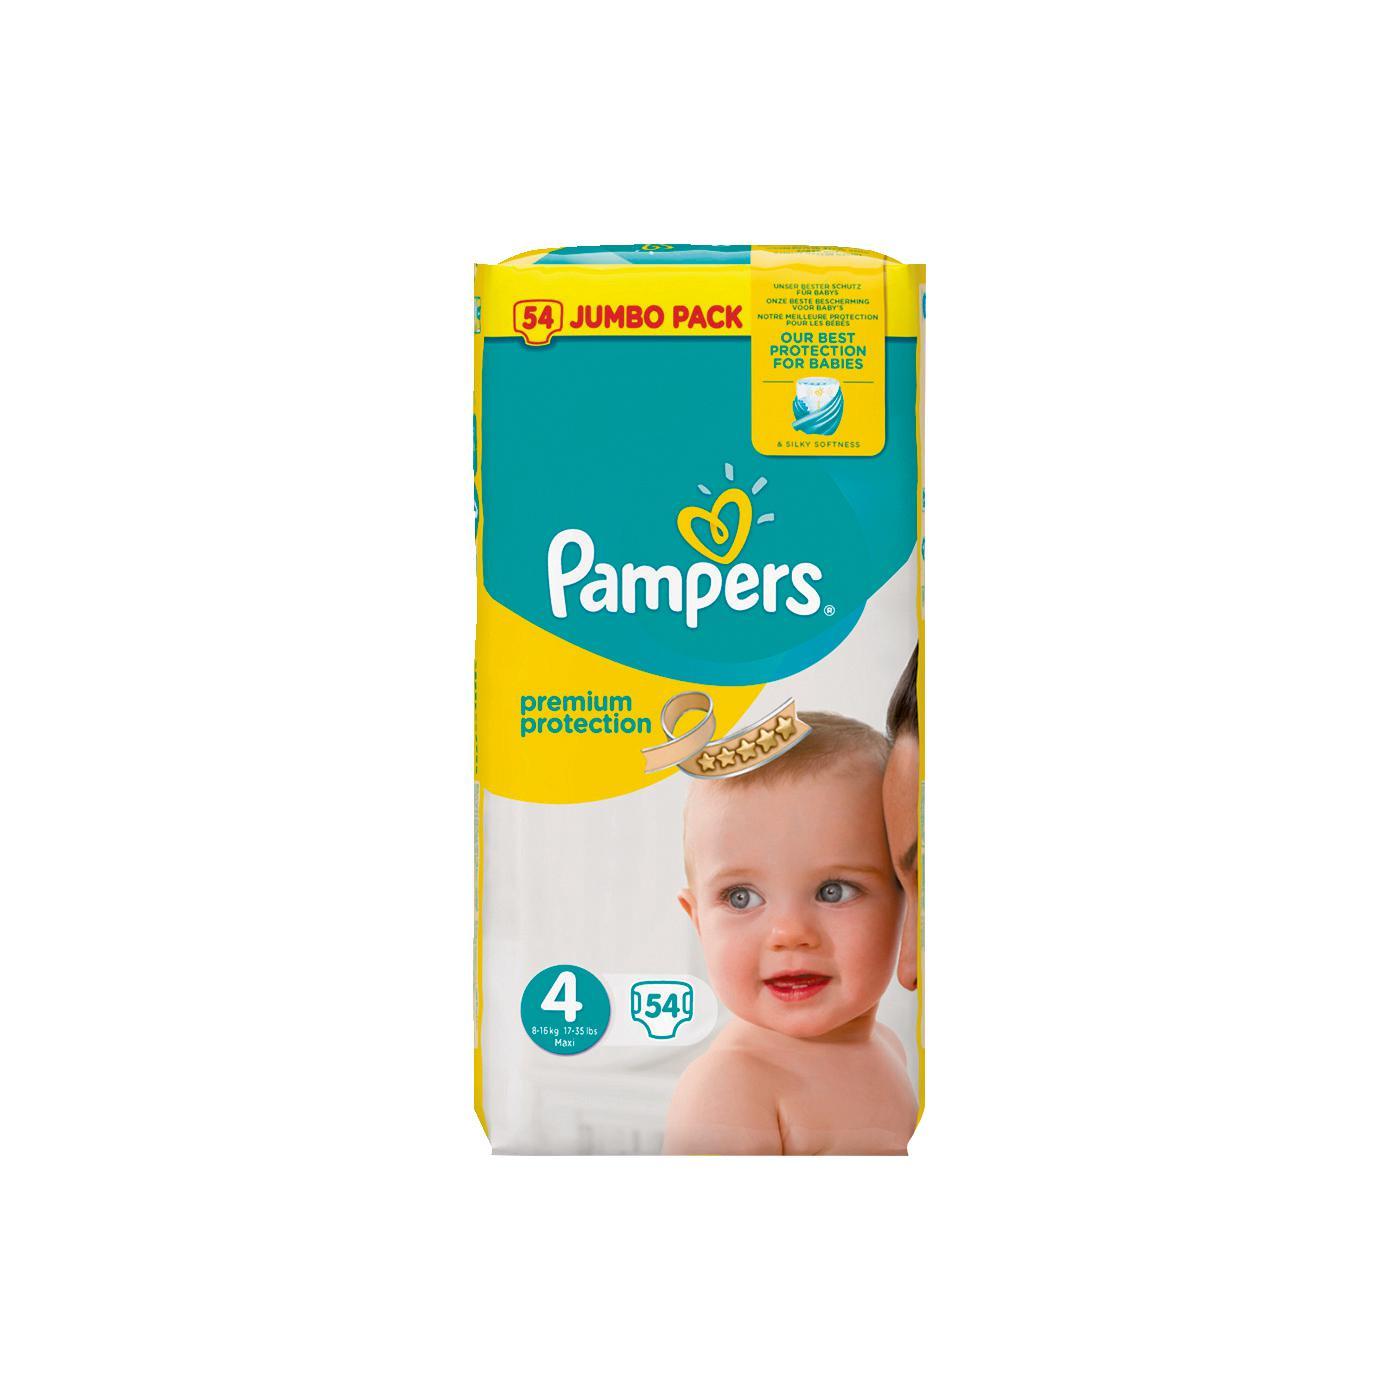 [Rossmann] Pampers Premium Protection - 2 Jumbo Packs mit 6€ Rabatt (23 Cent/Windel)